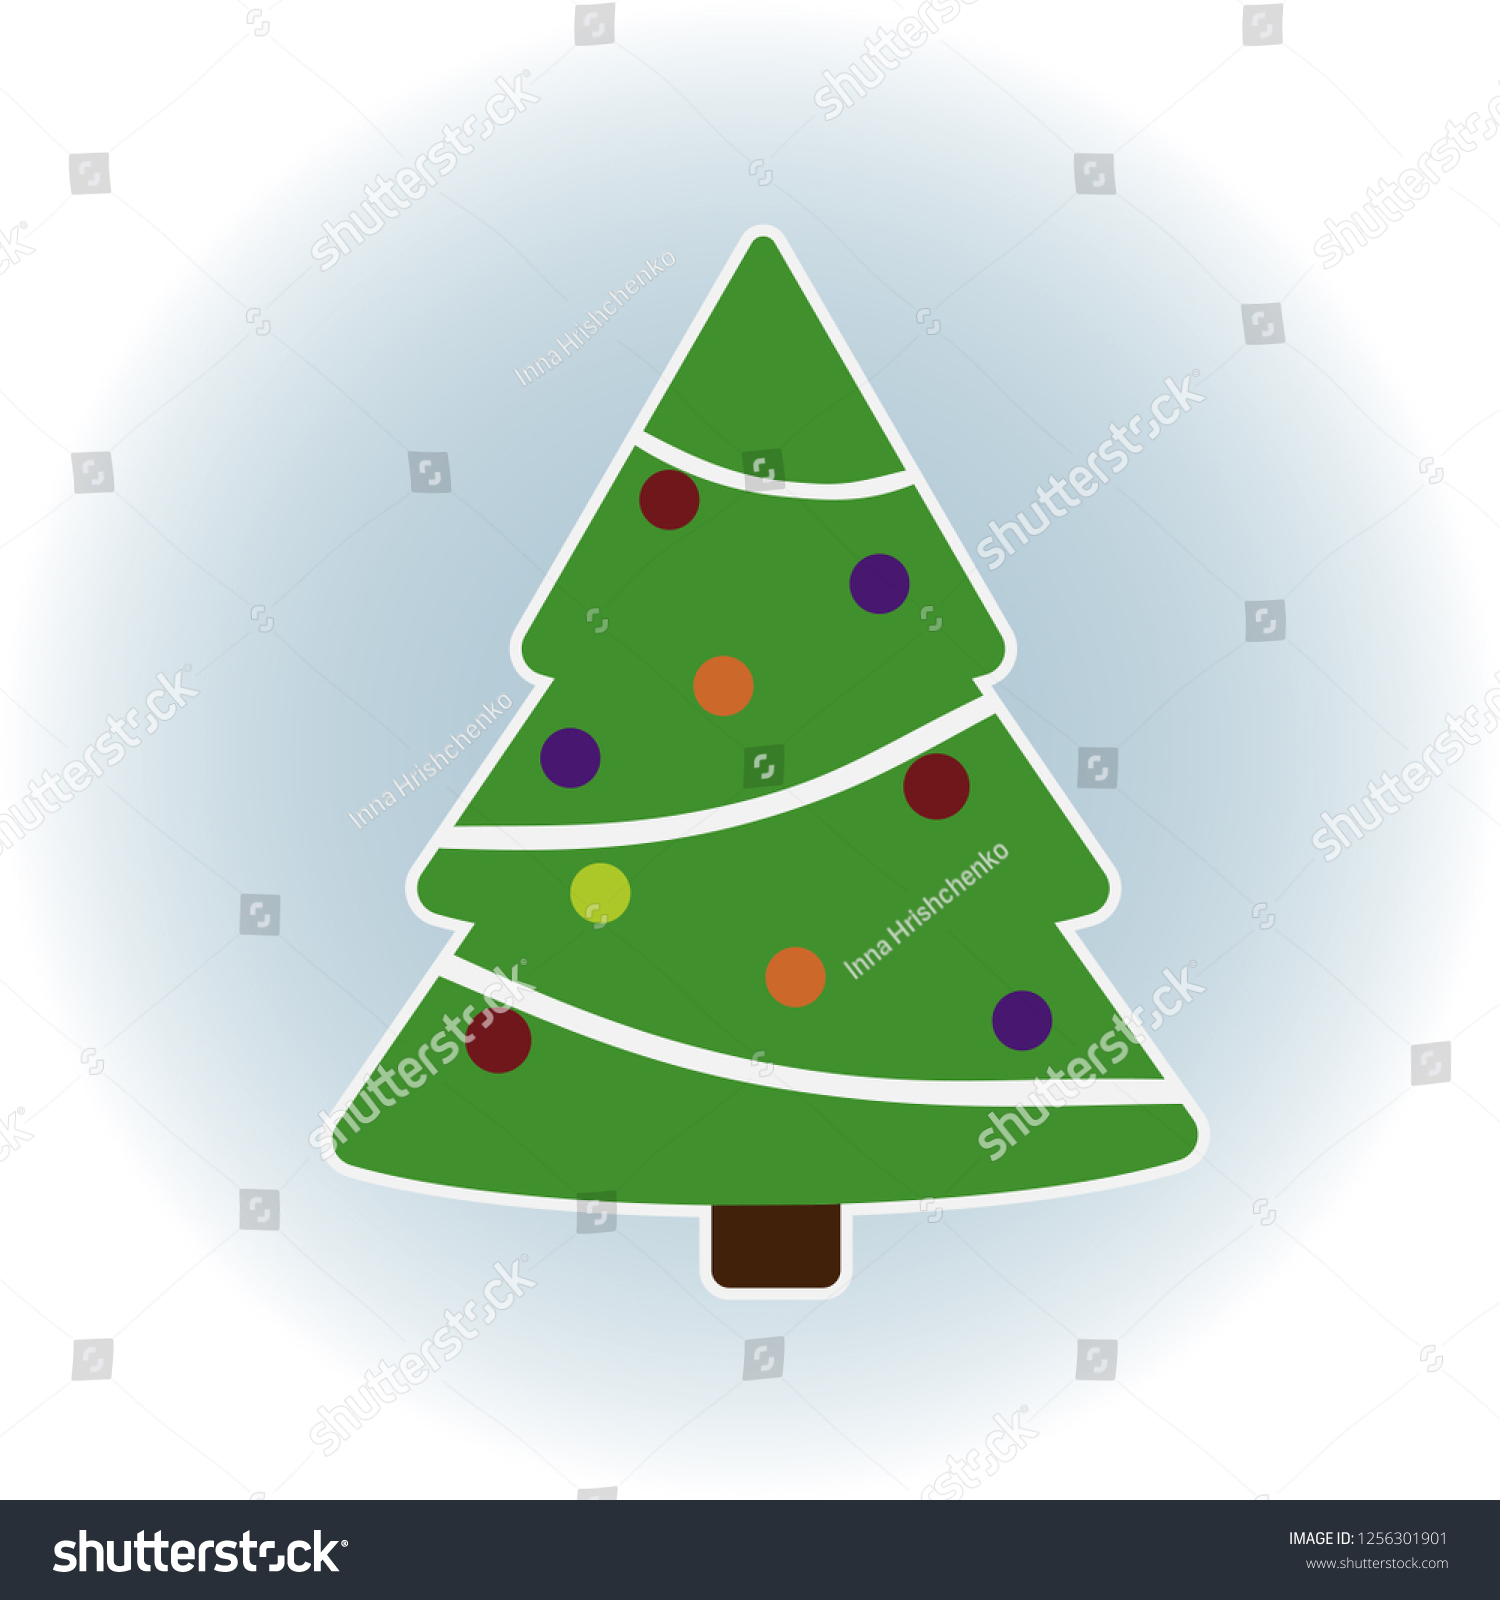 Green Christmas Tree Toys Illustration Print Stock Vector Royalty Free 1256301901